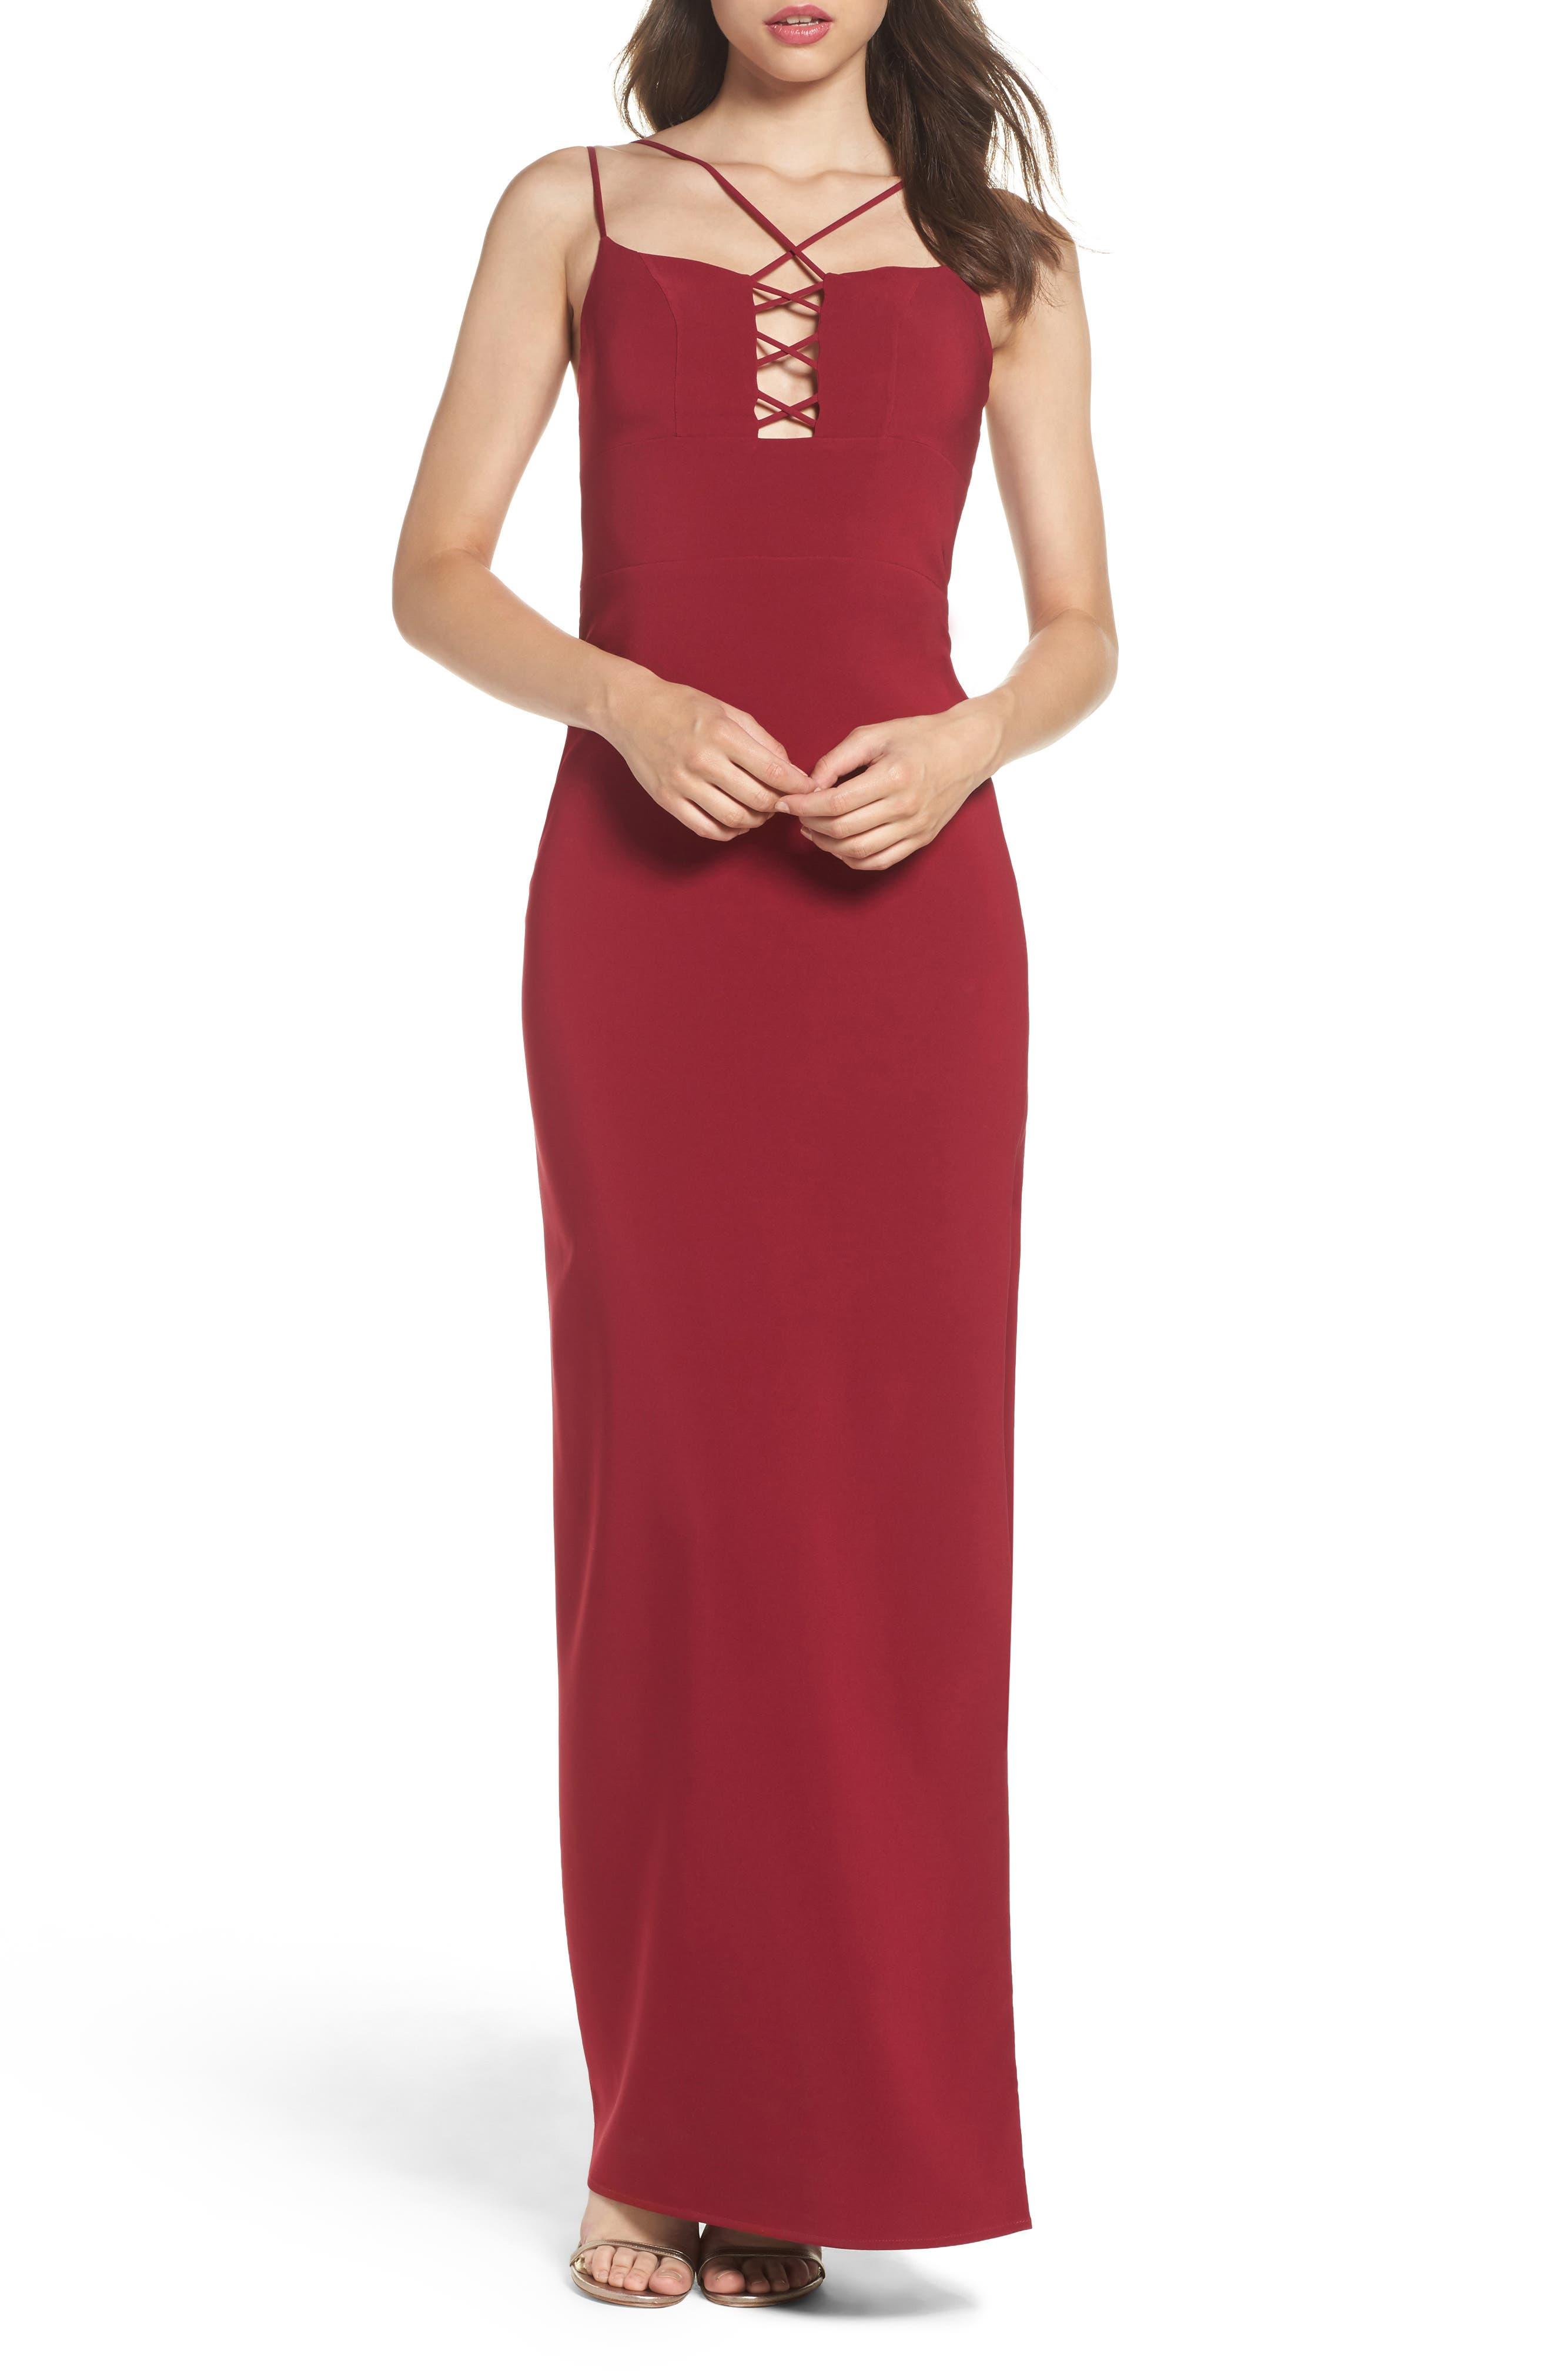 Starlett Gown,                             Main thumbnail 1, color,                             Wine